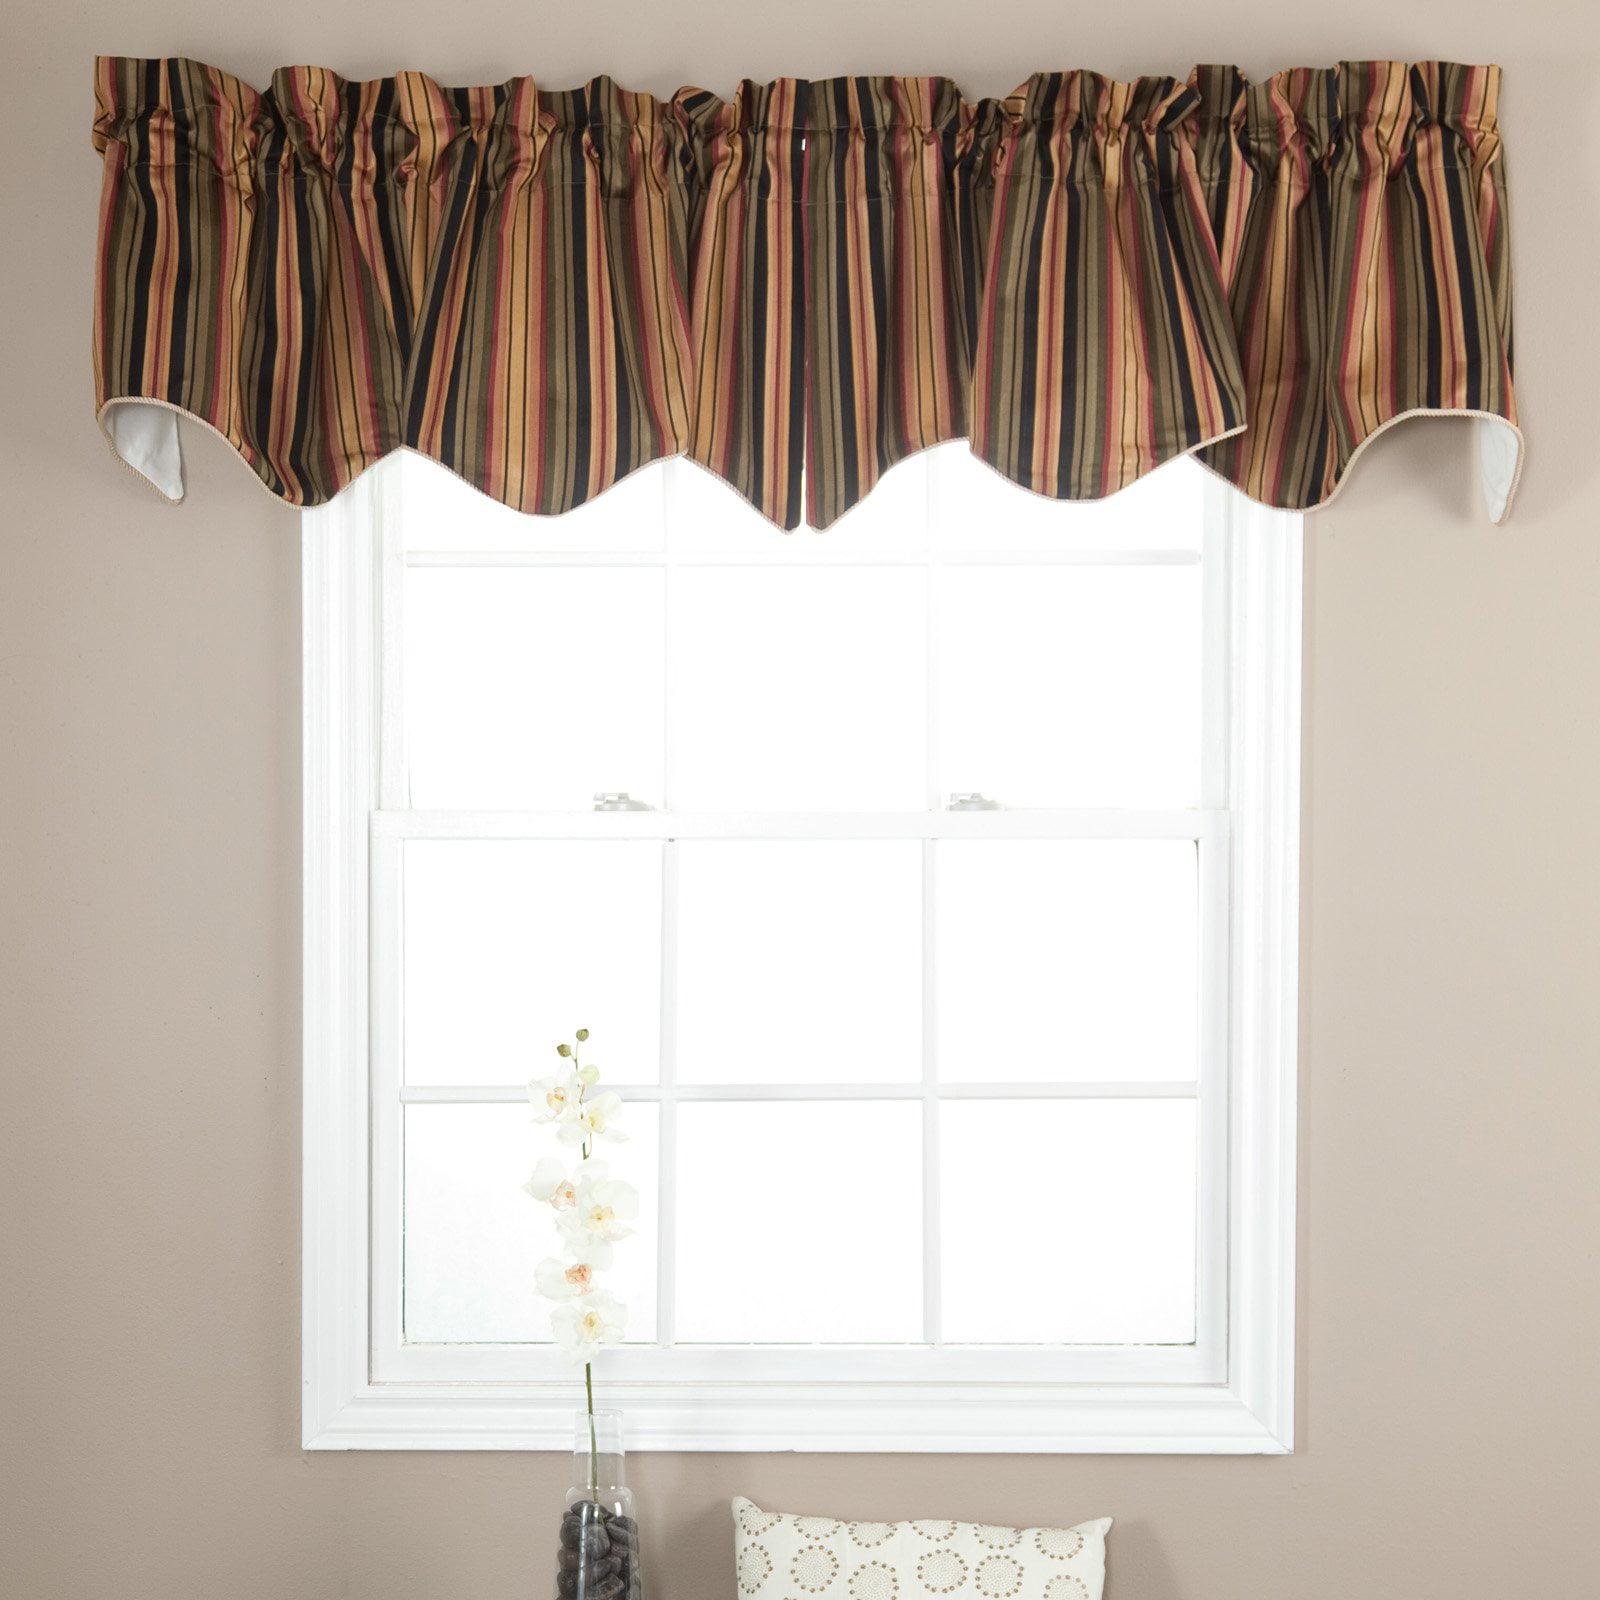 ellis crosby pinch pleat curtain panel pair